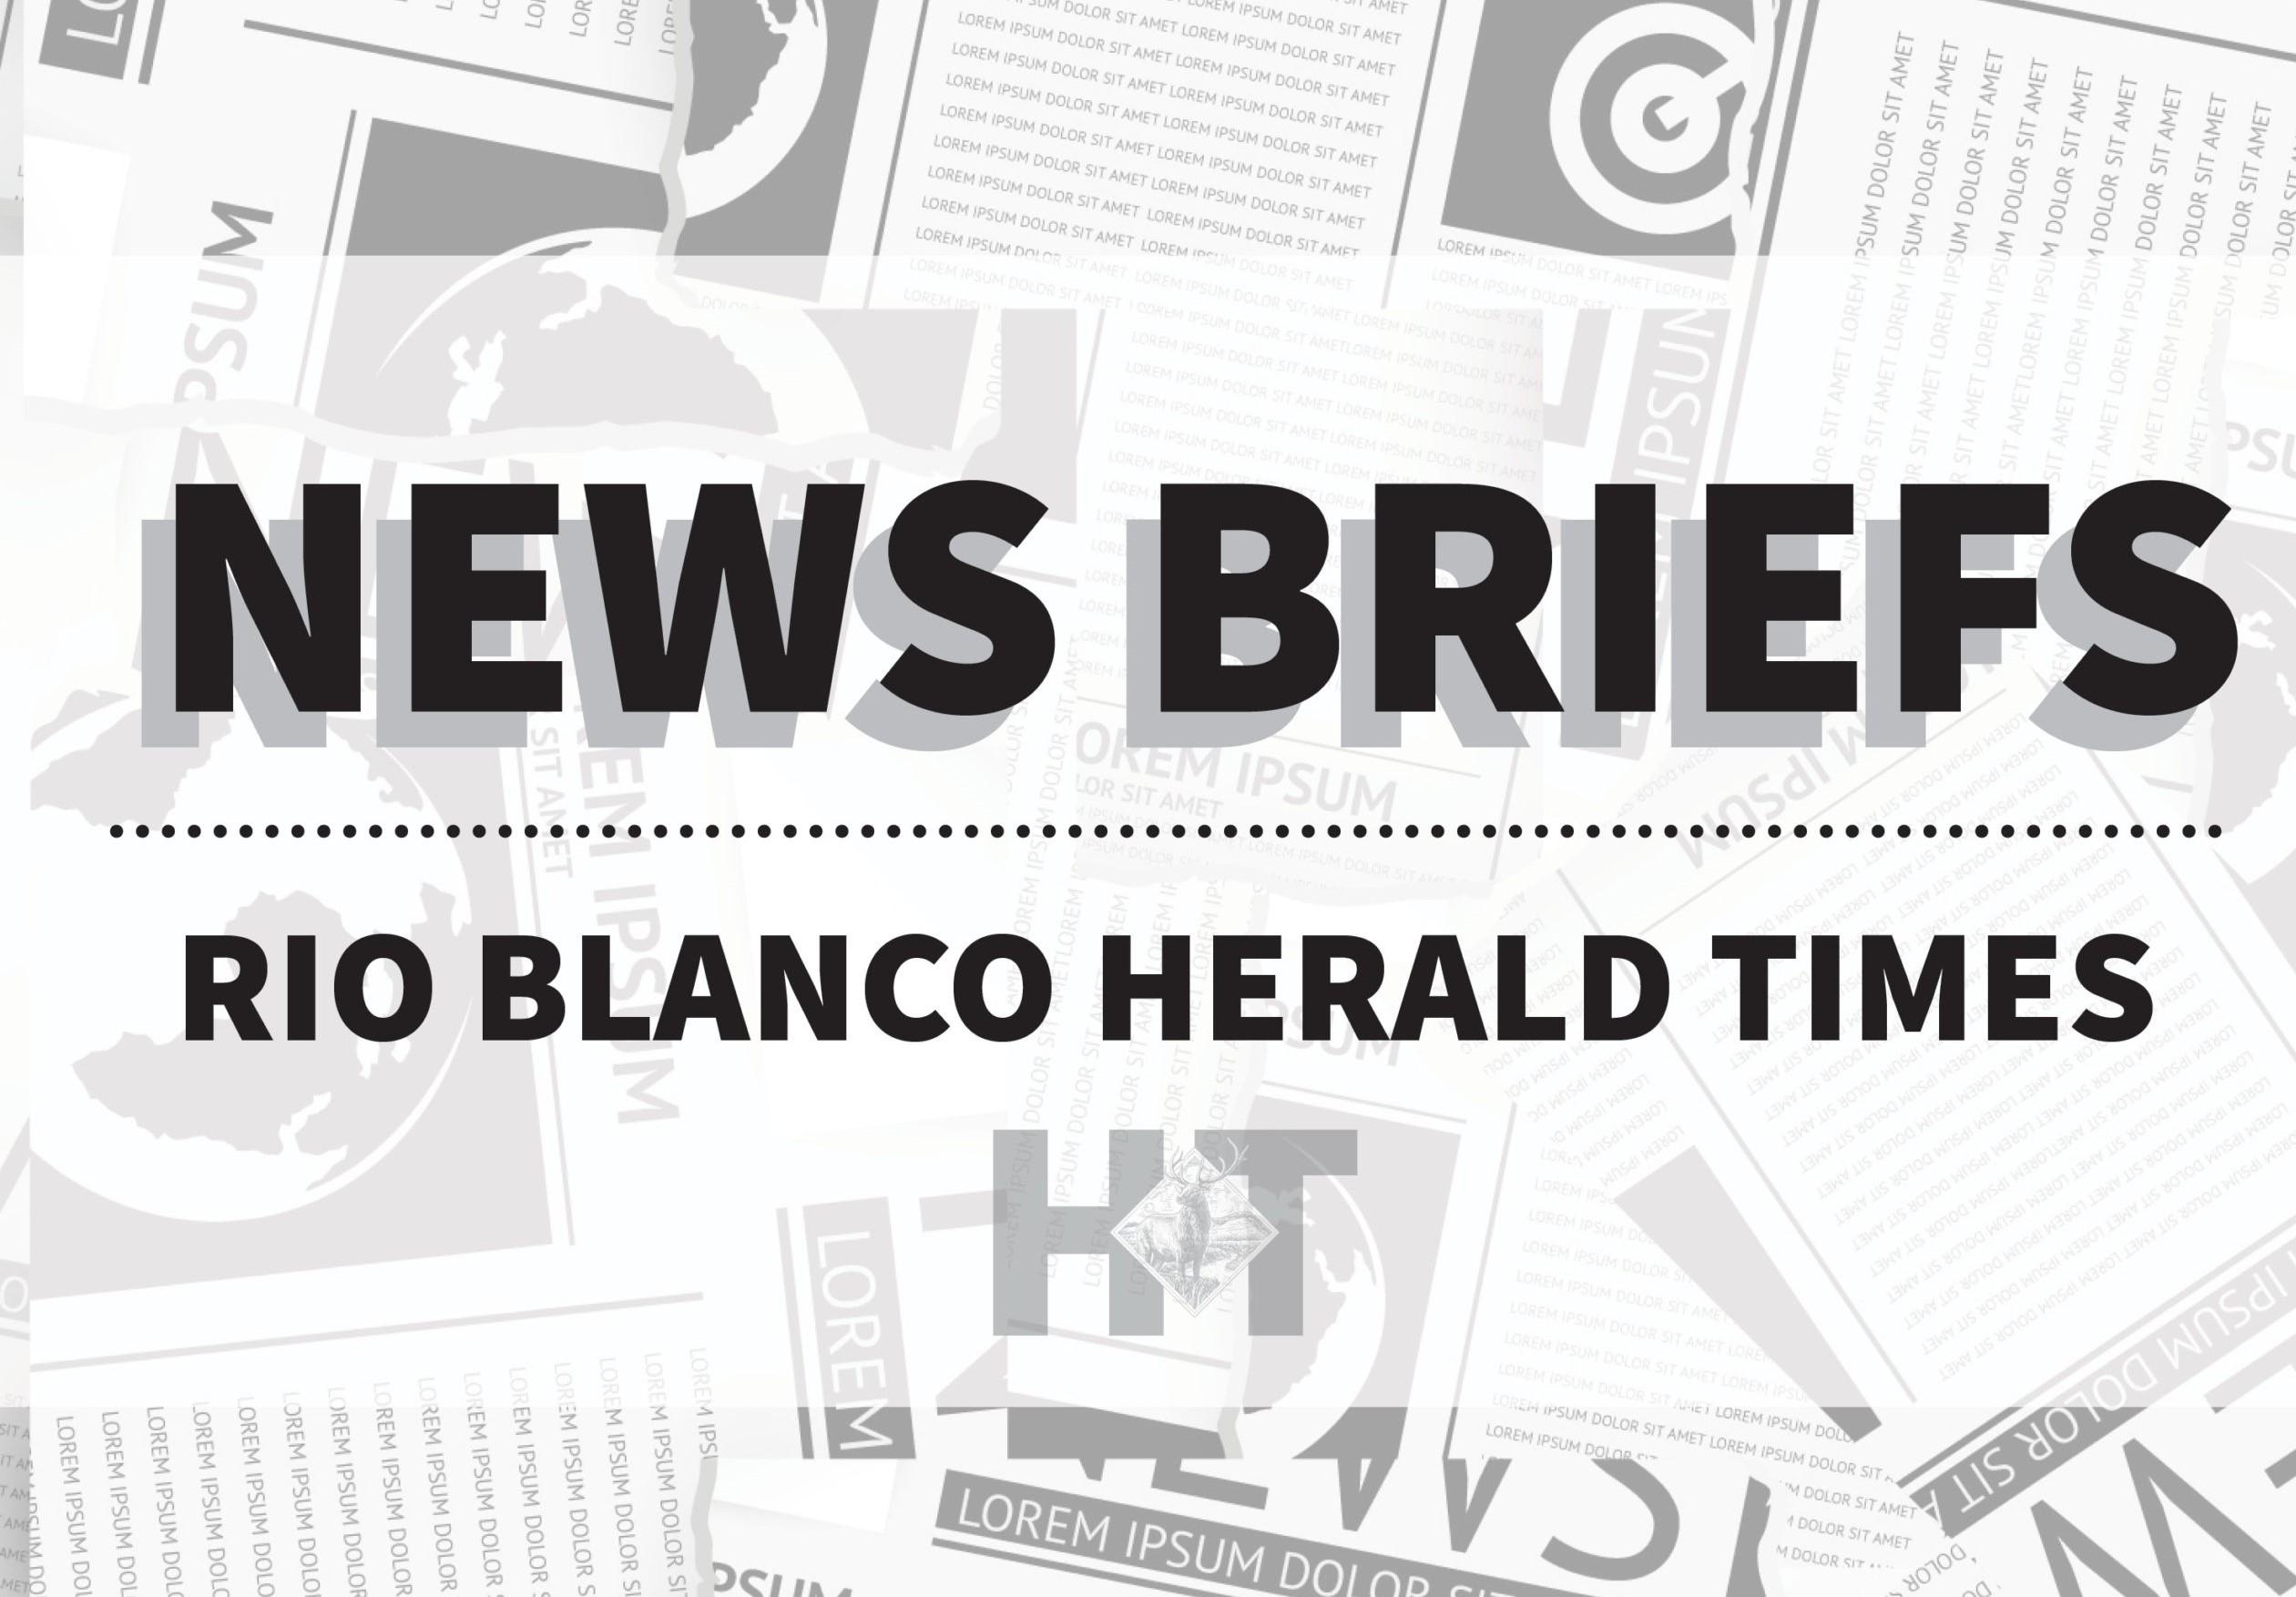 news briefs cropped